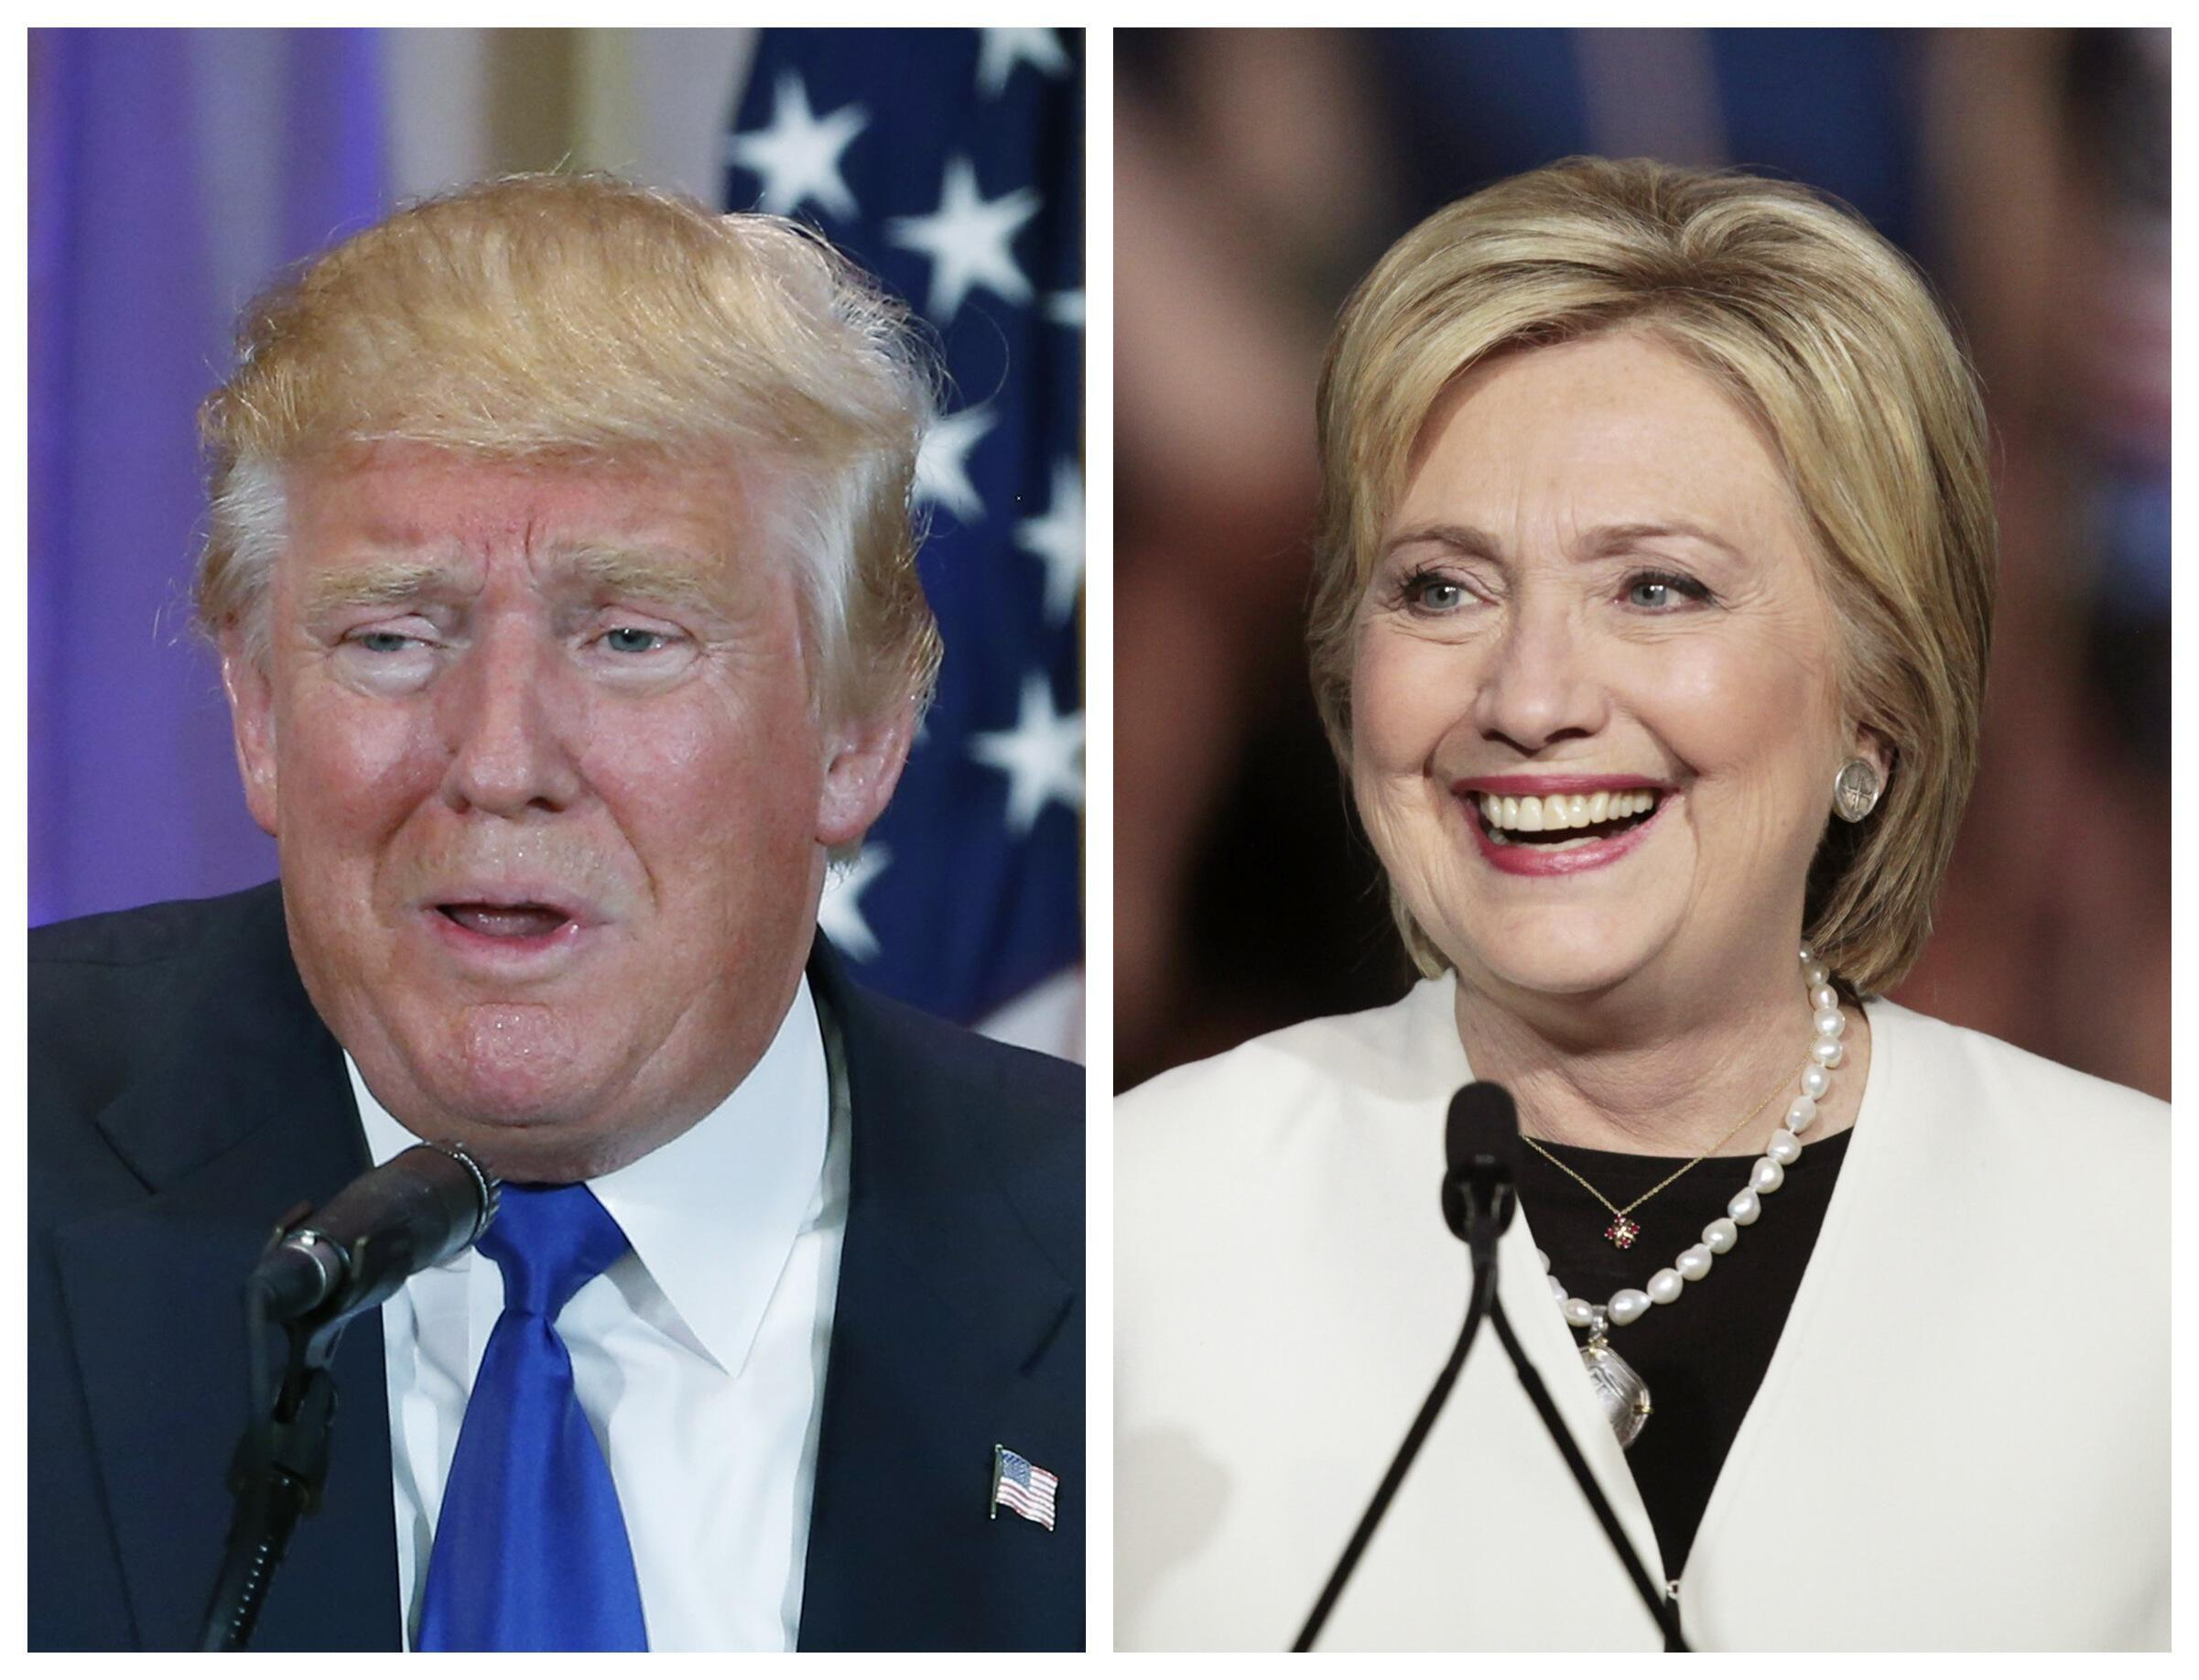 El candidato republicano, Donald Trump y la candidata demócrata Hillary Clinton.